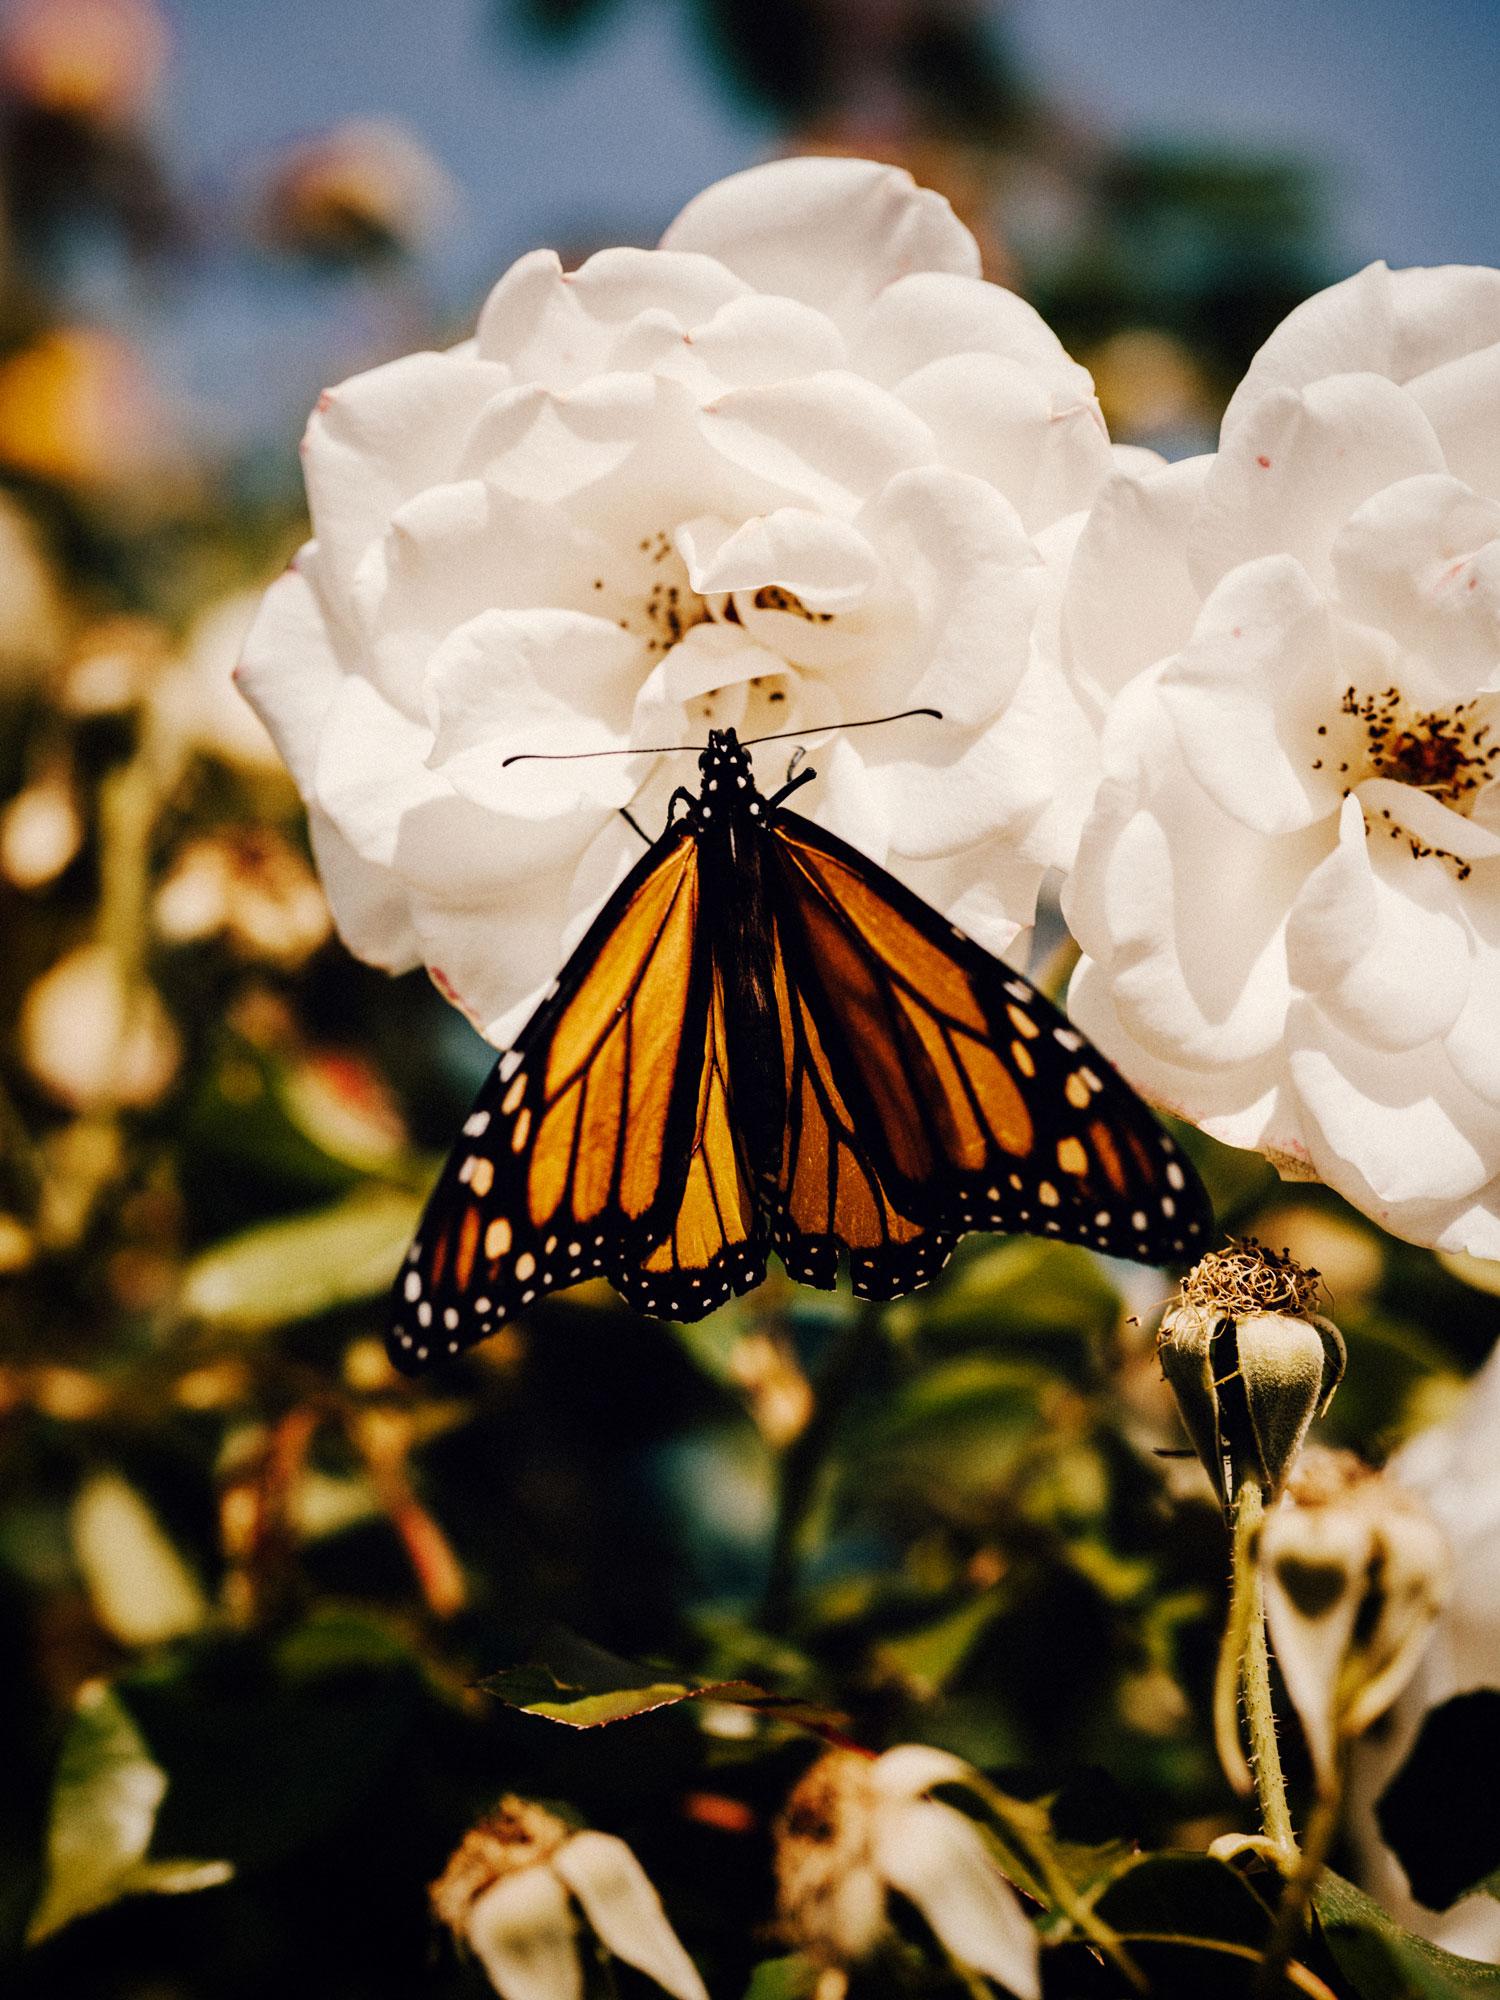 Brand_Vineyard_Butterflies_Vert_0407_RGB.jpg